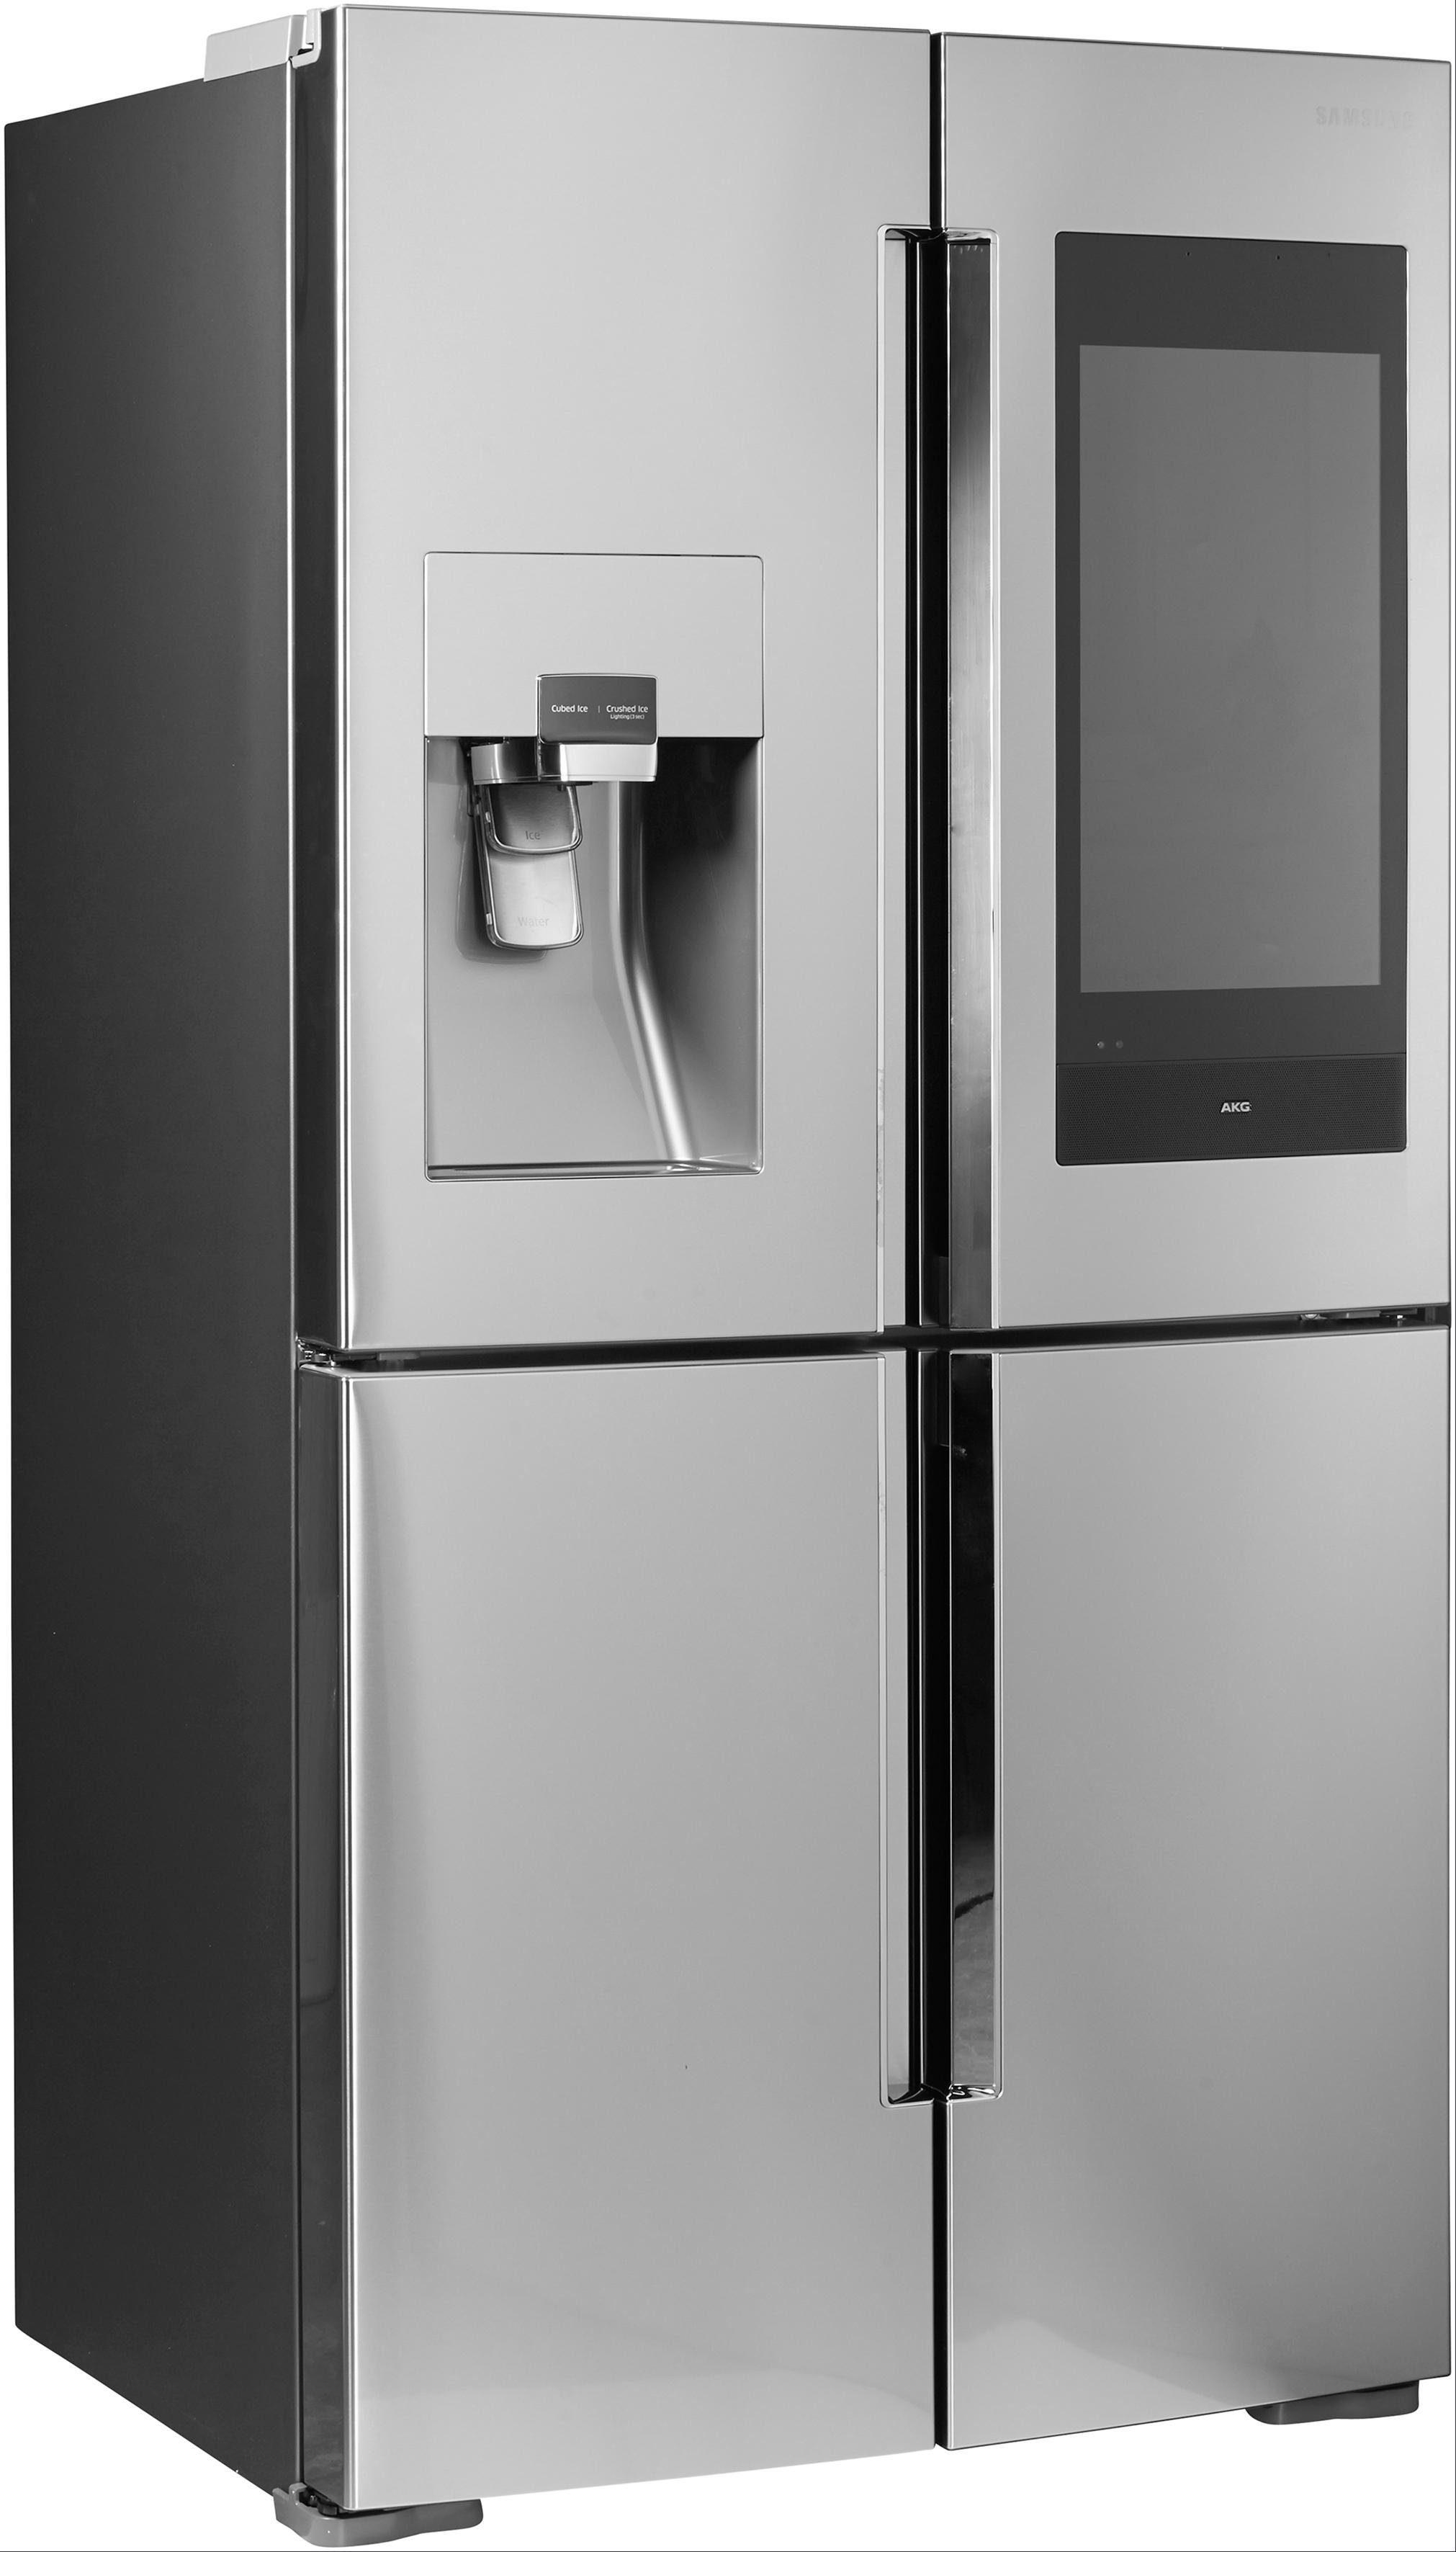 Samsung French Door Kühlschrank RF56N9740SR/EF, 182,5 cm hoch, 90,8 cm breit, Family Hub – Display im Kühlschrank